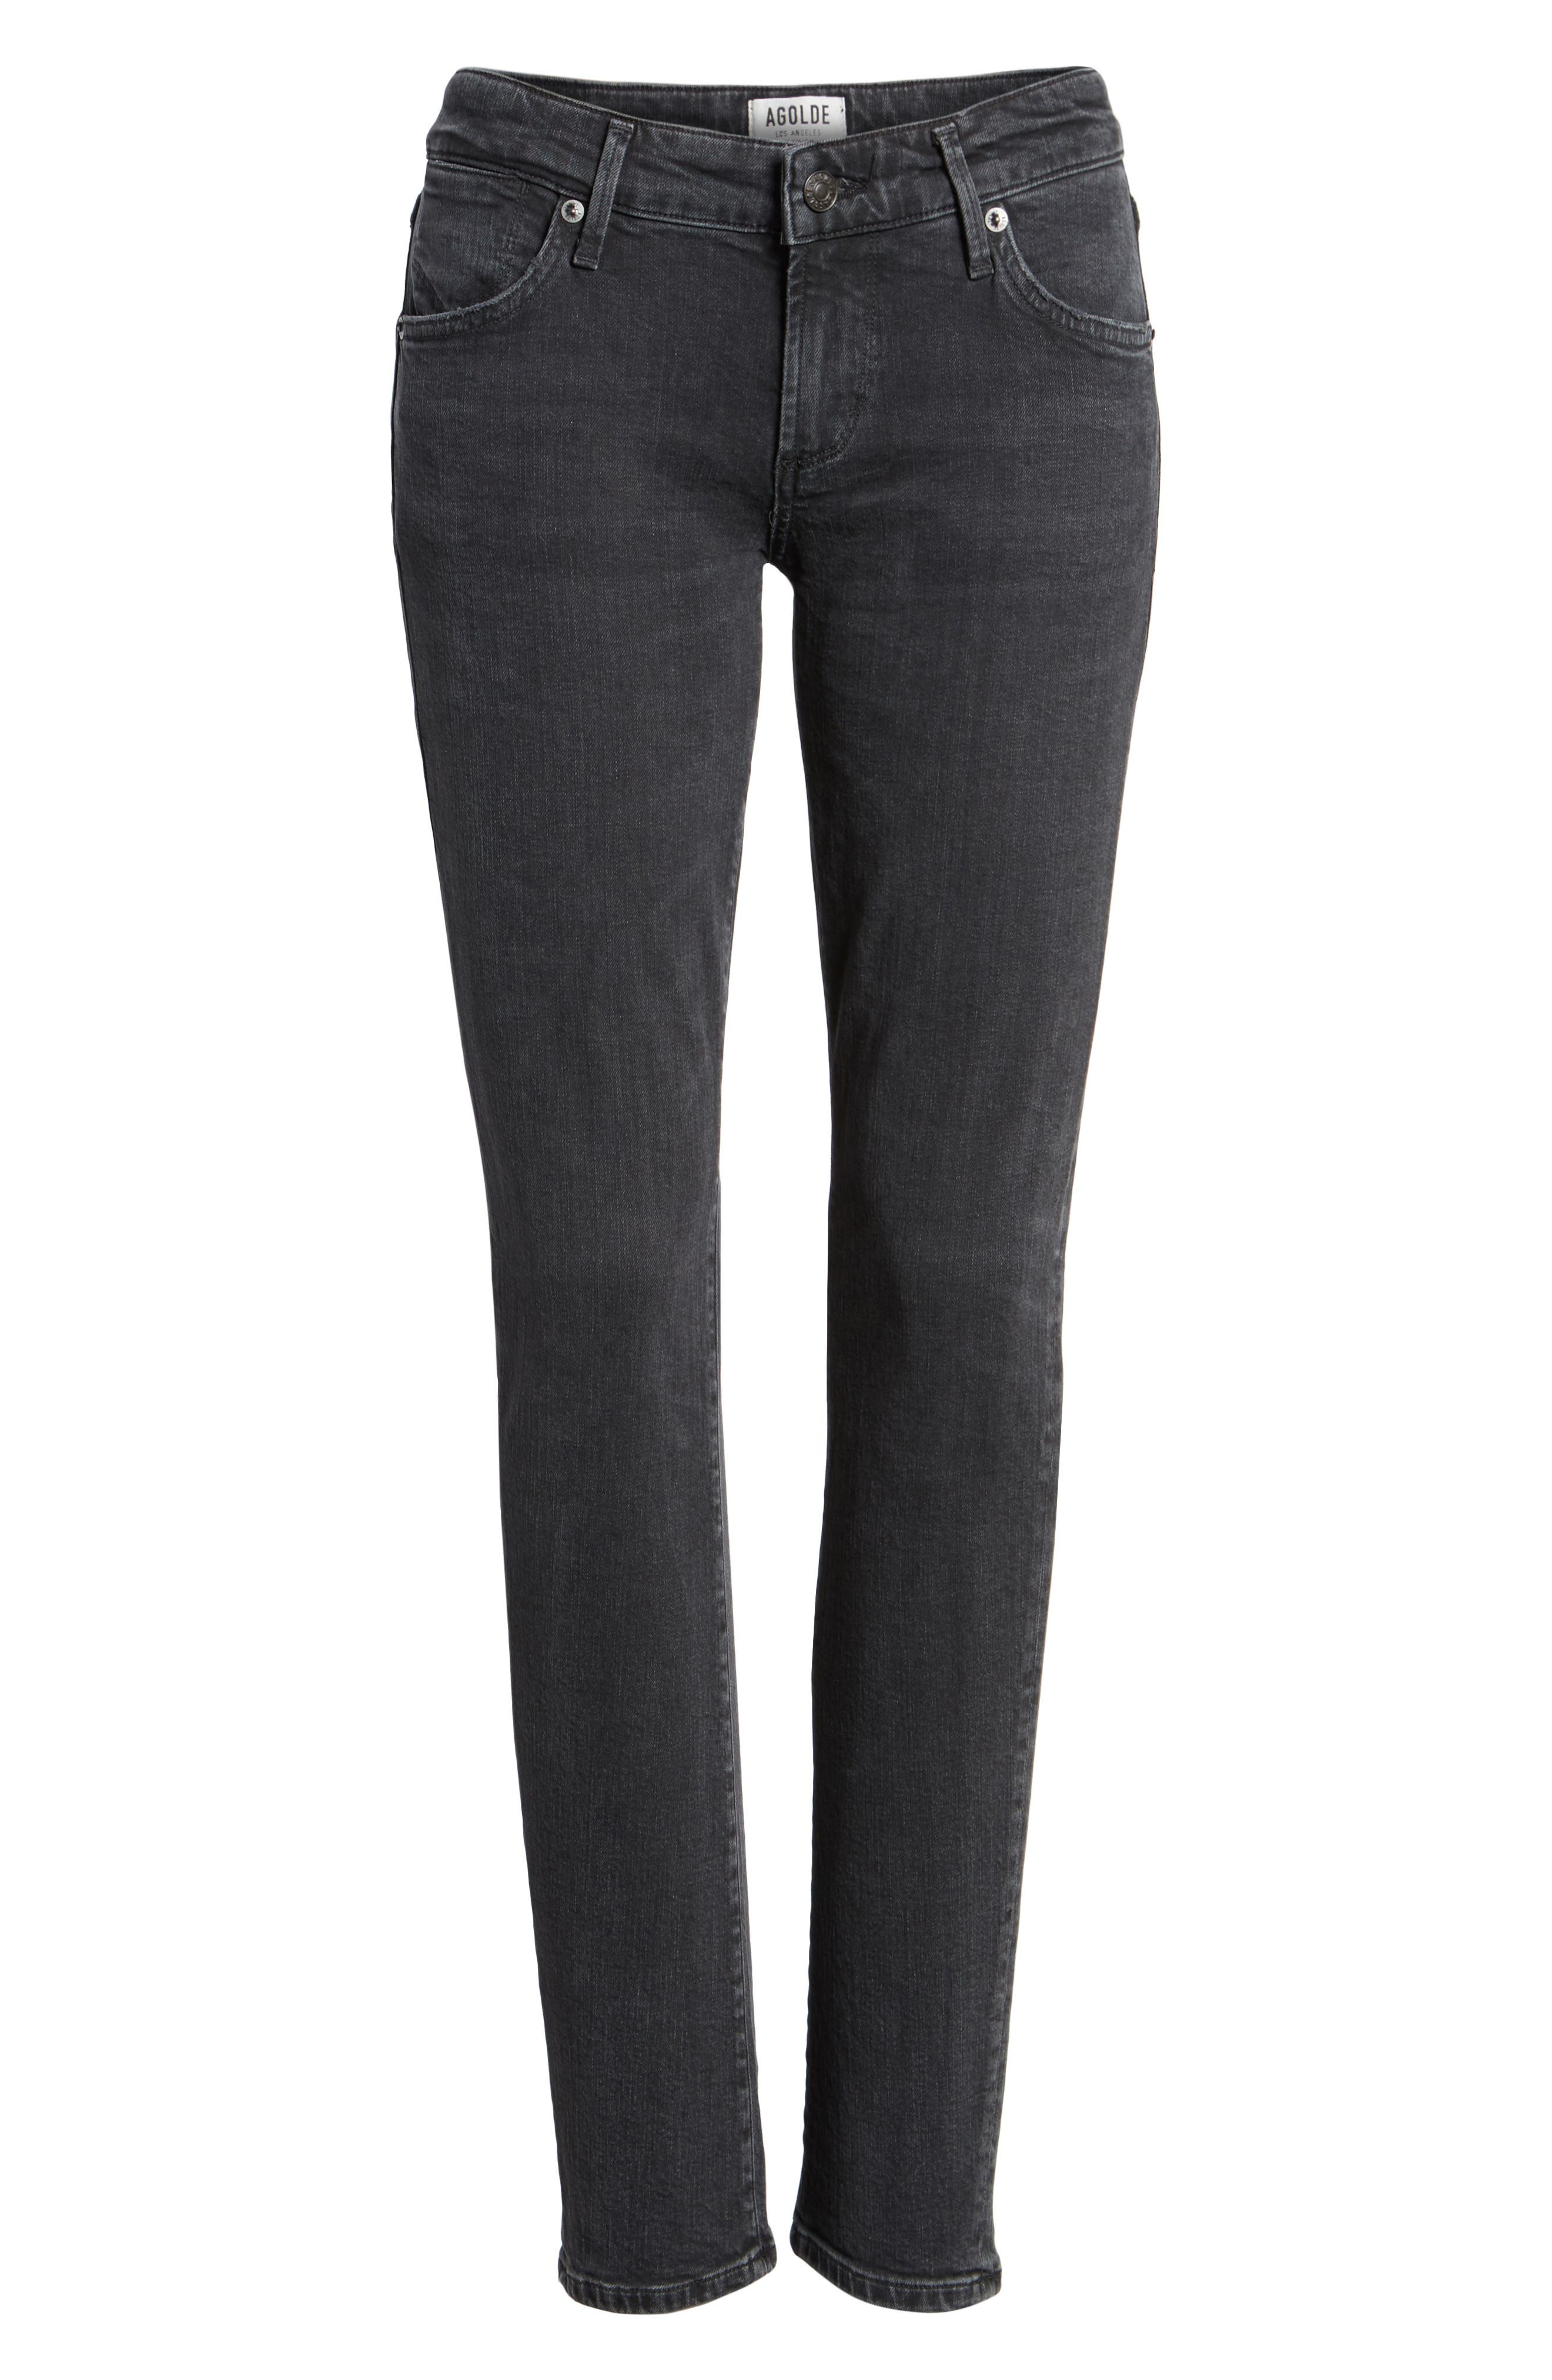 Chloe Low Rise Slim Jeans,                             Alternate thumbnail 6, color,                             072